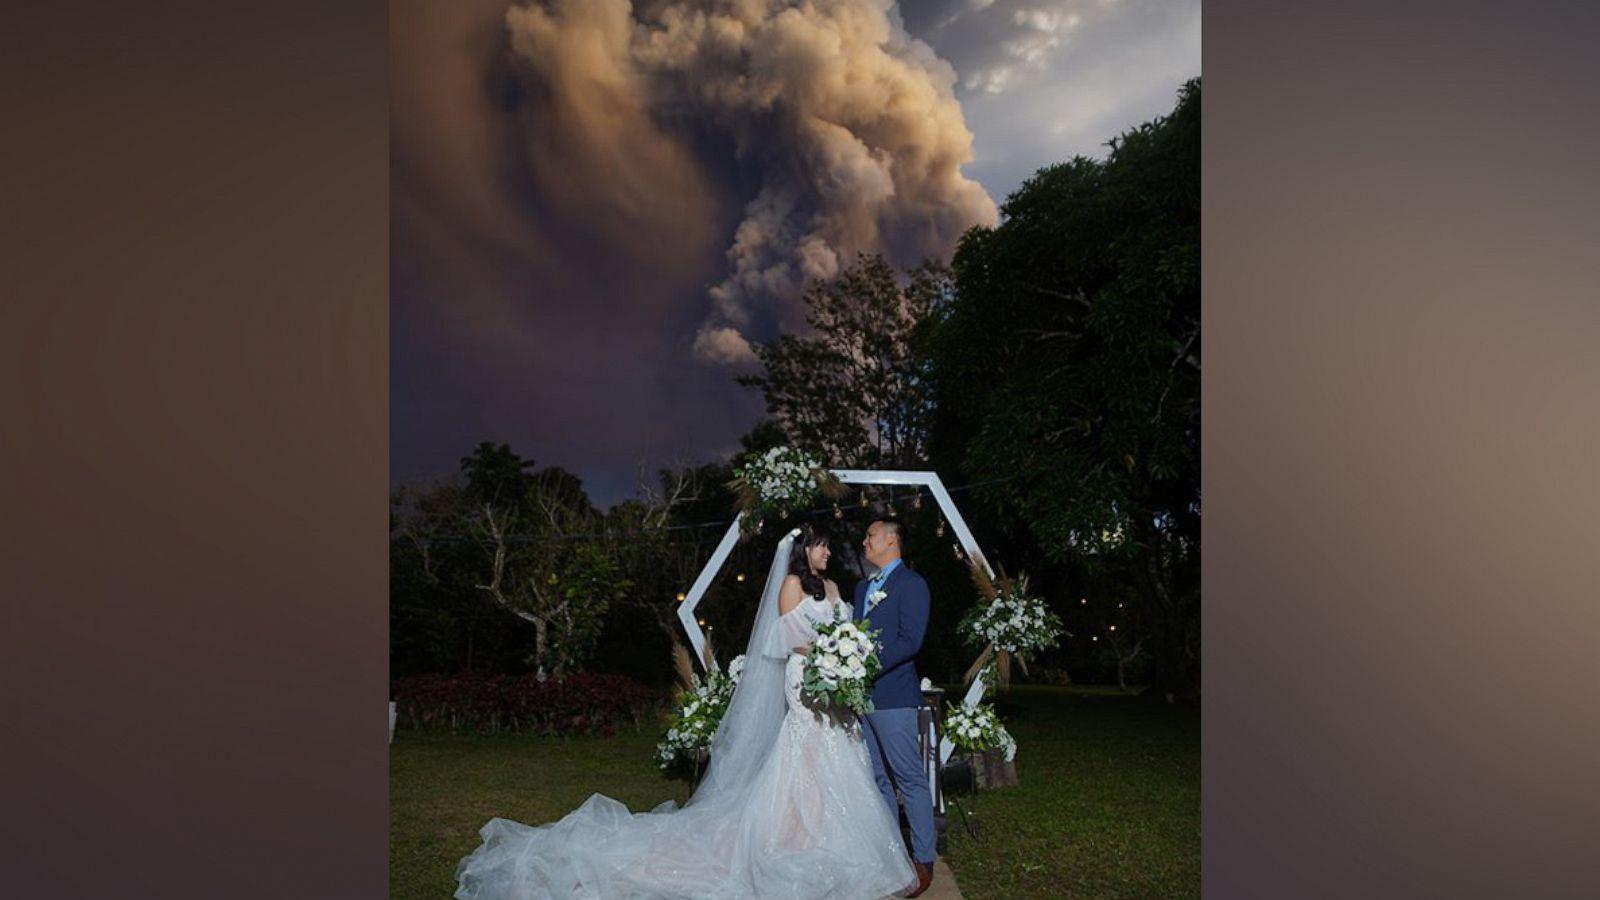 phillipines-volcano-ht-rc-200113-hpMain-v4x3-16x9-1600